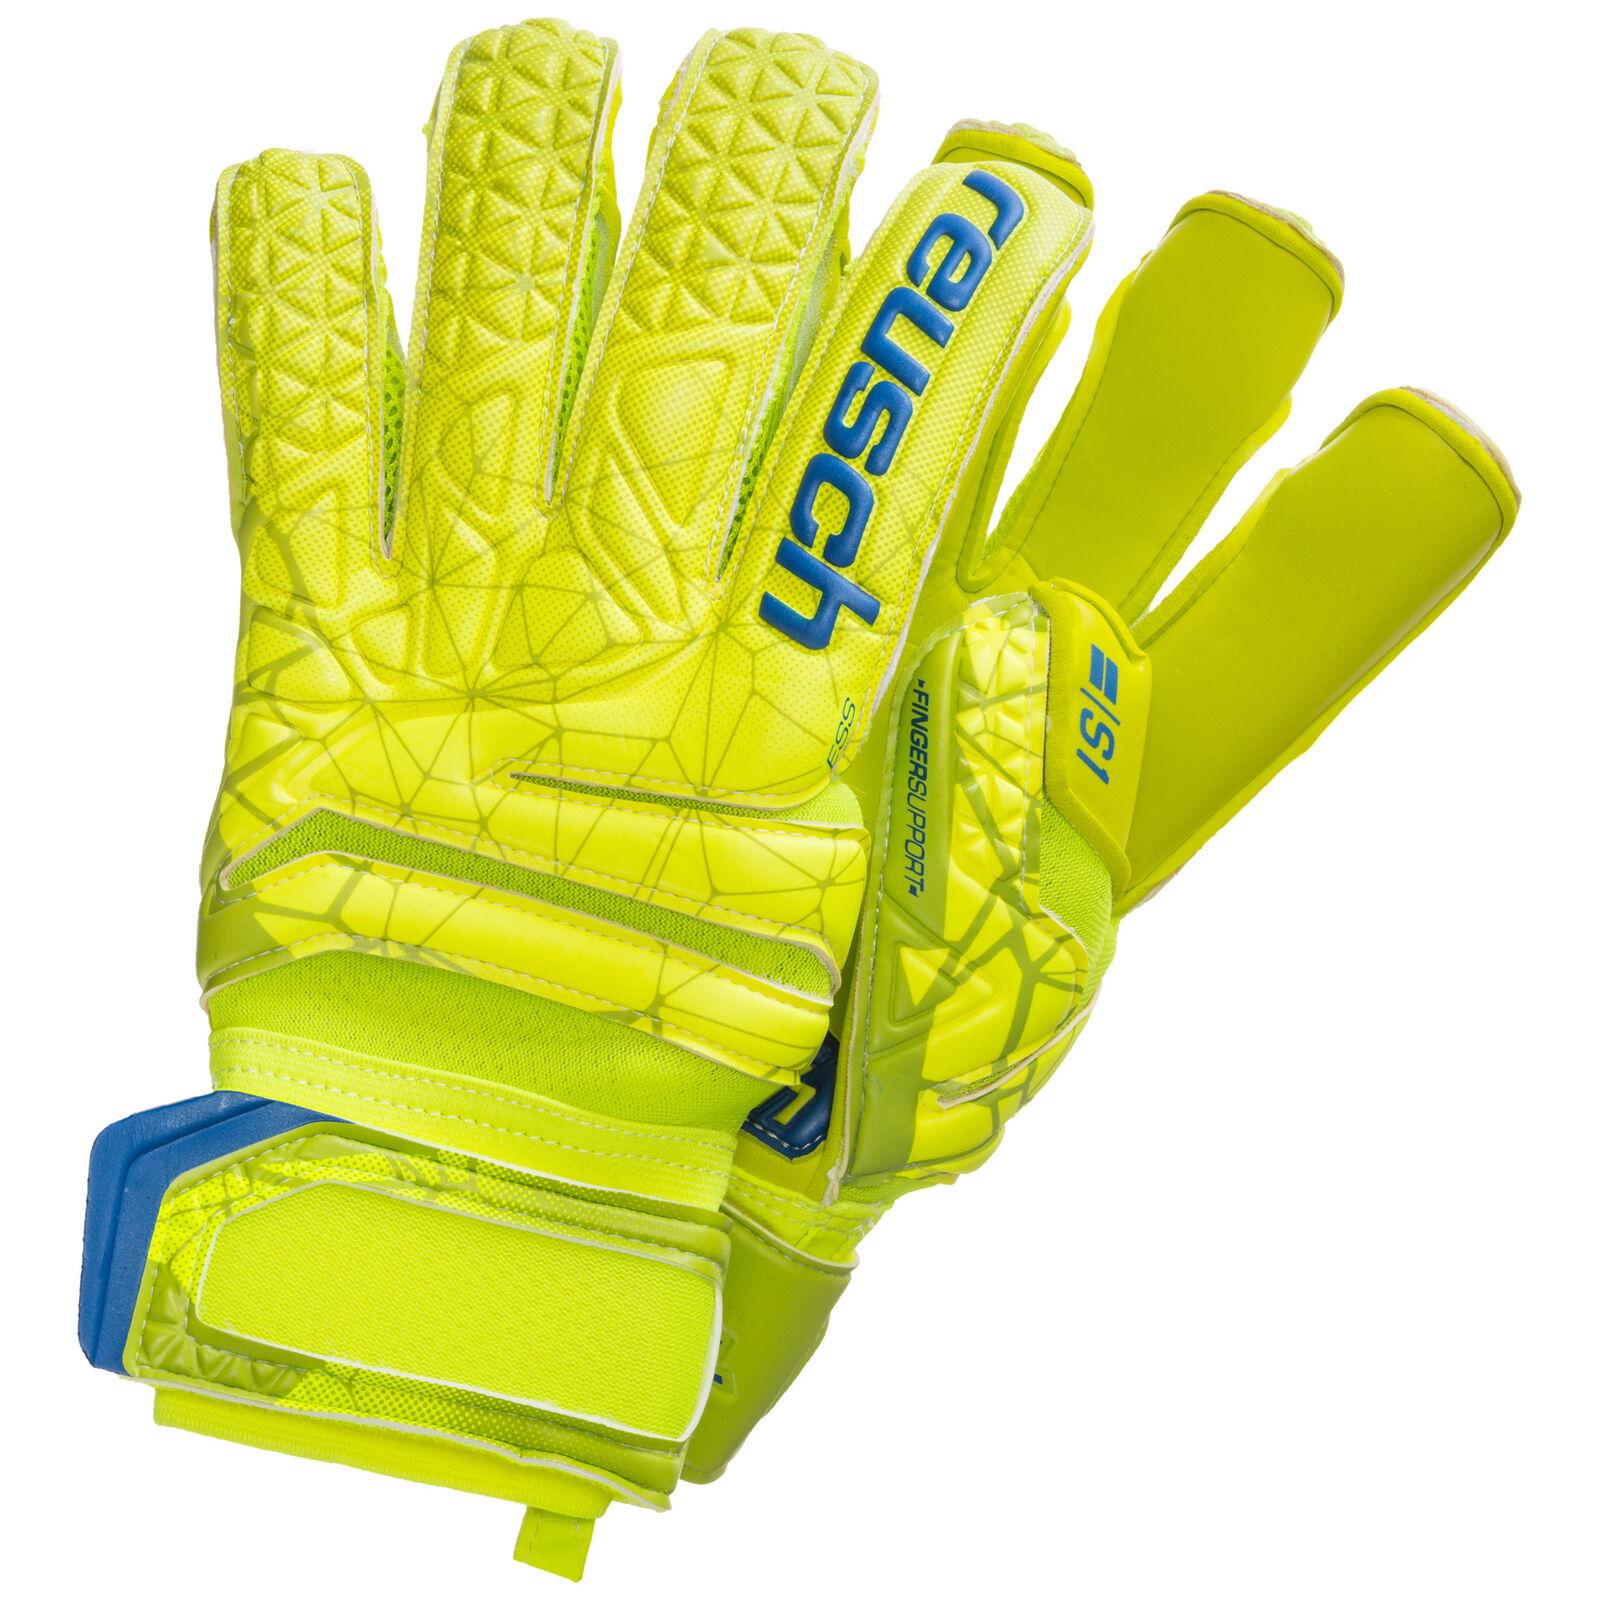 Reusch Fit Control S1 S1 S1 Evolution Finger Support Torwarthandschuh NEU ea77ef